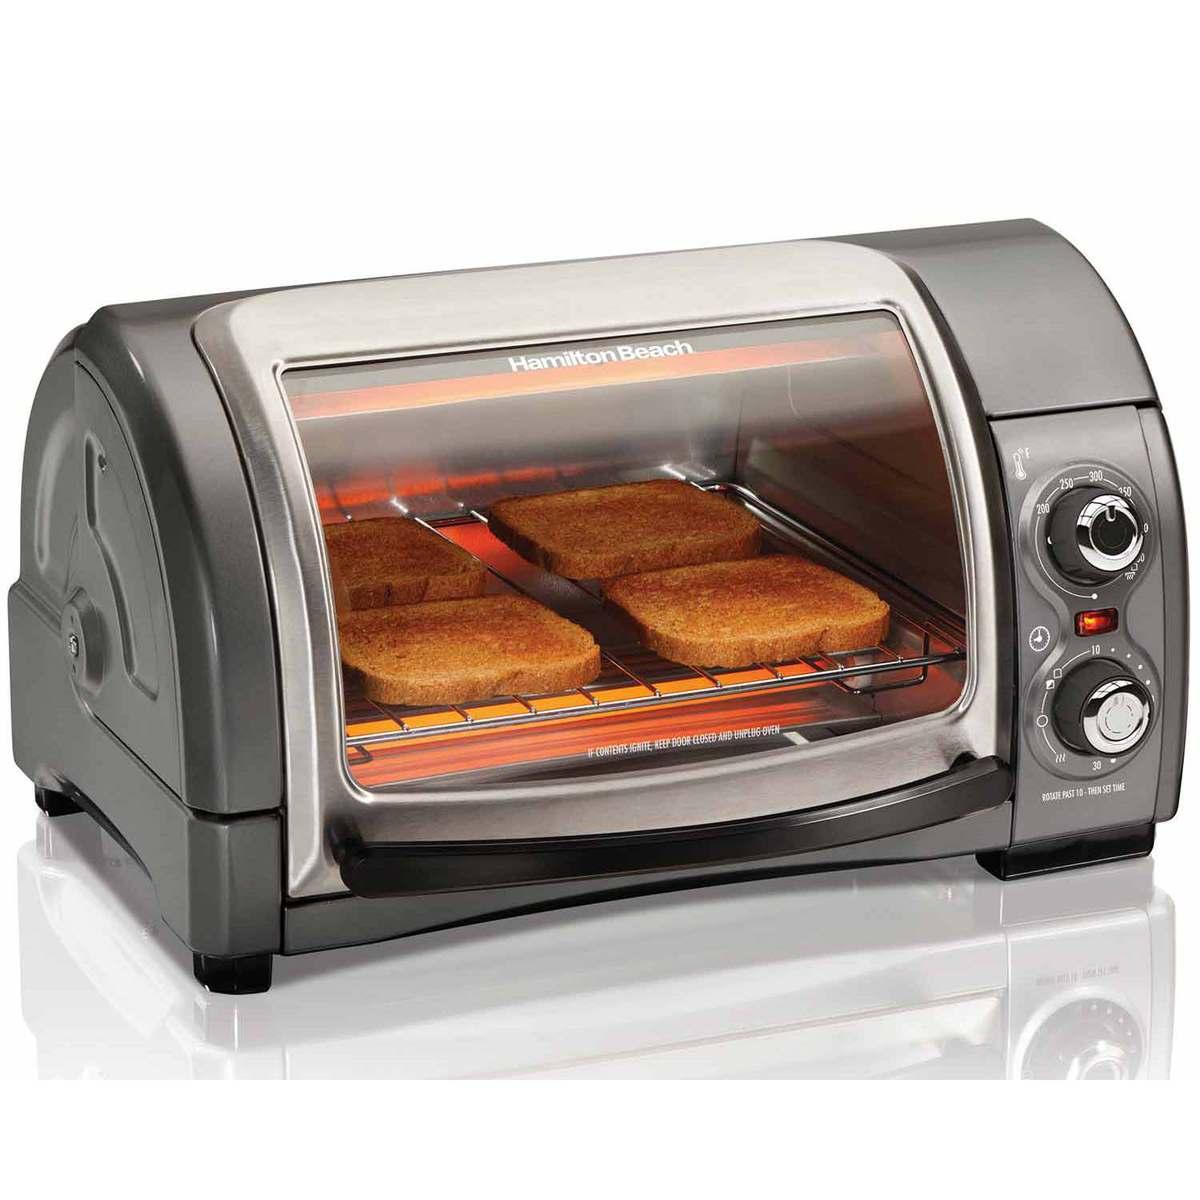 Easy Reach® Toaster Oven with Roll-Top Door (31334)